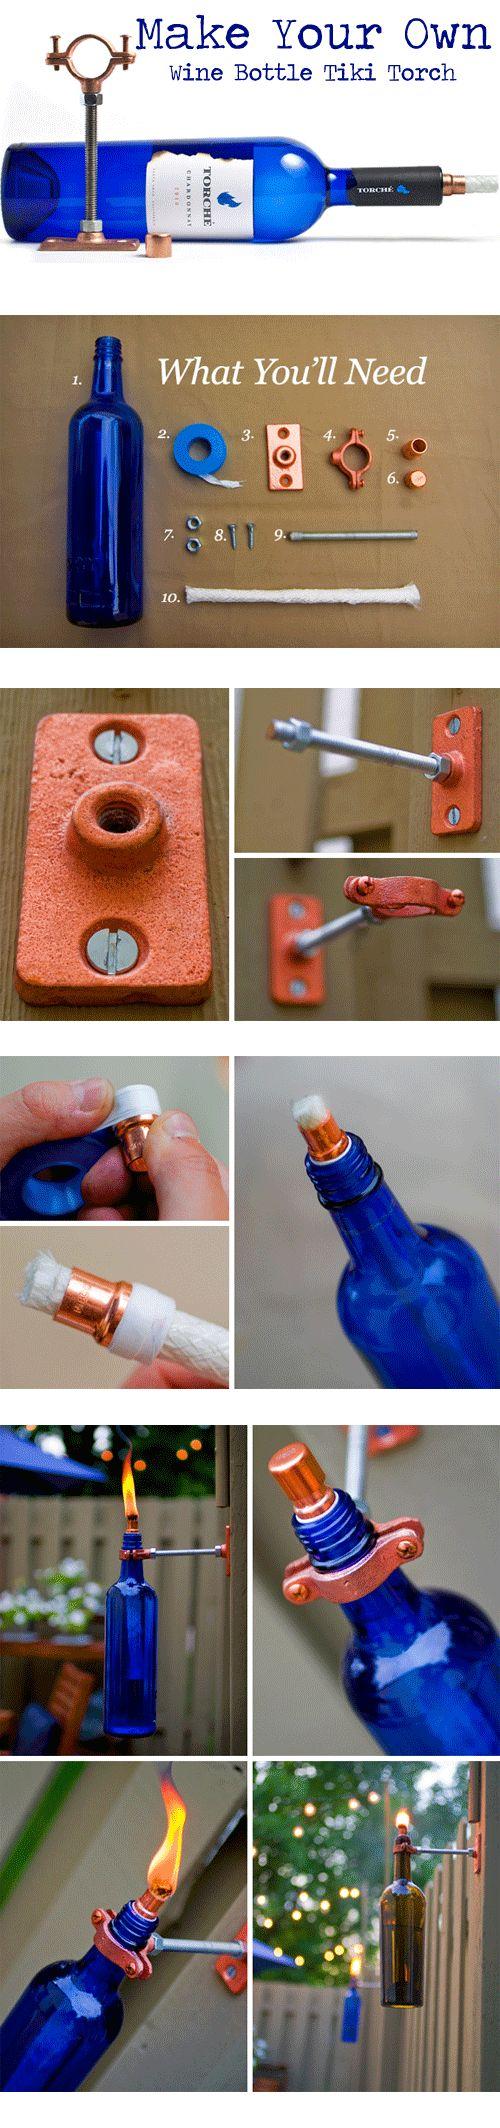 DIY wine-bottle-tiki-torch